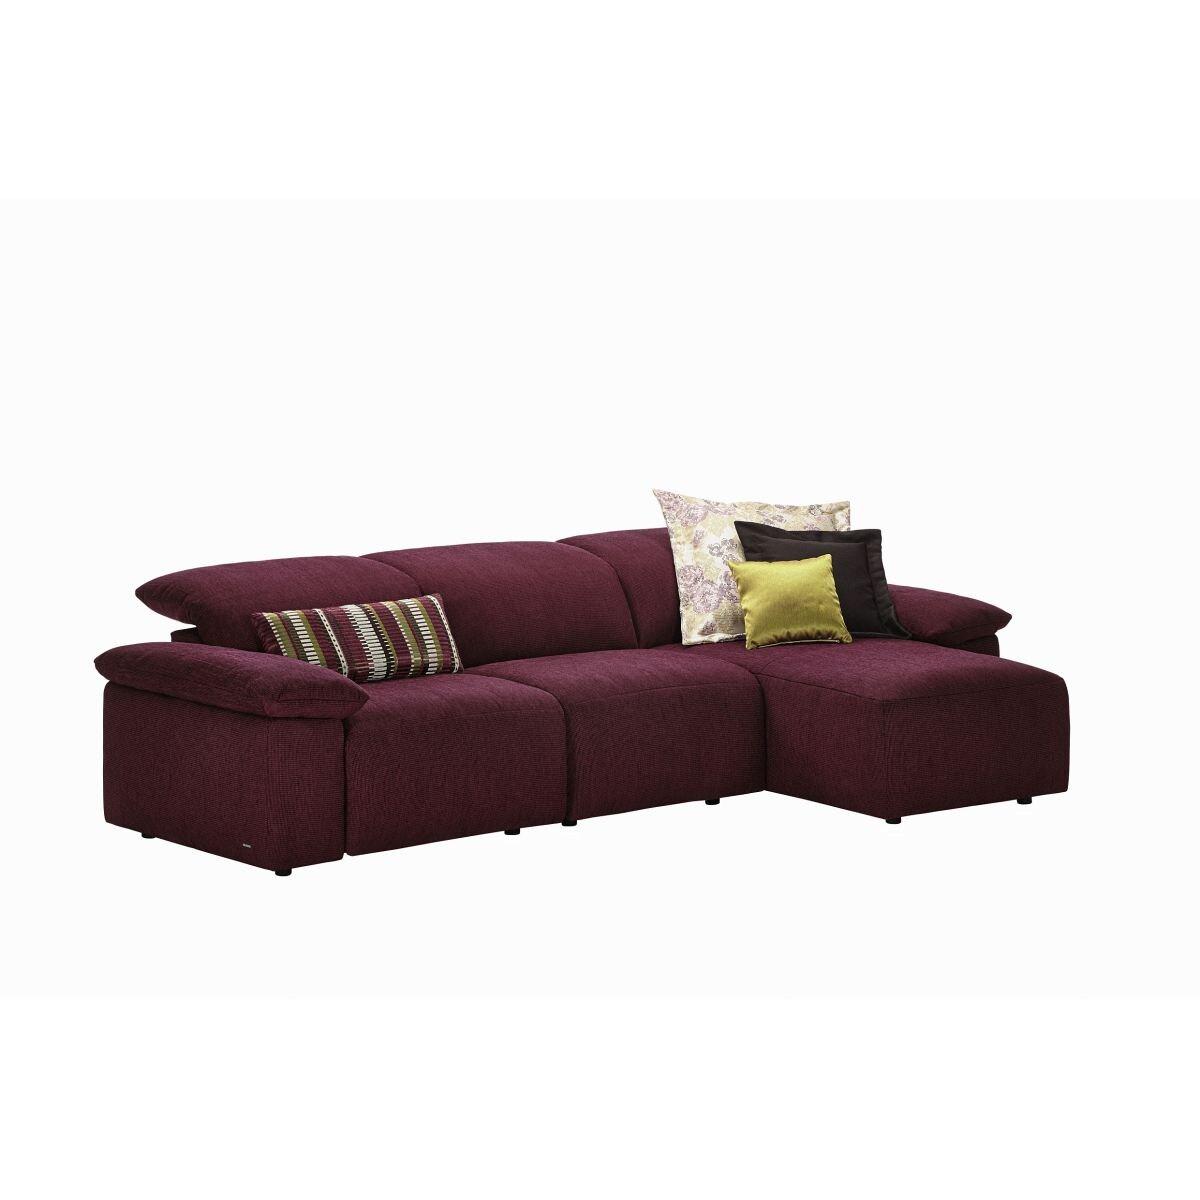 mondo rundecke merit stoffbezug porta porta m bel. Black Bedroom Furniture Sets. Home Design Ideas